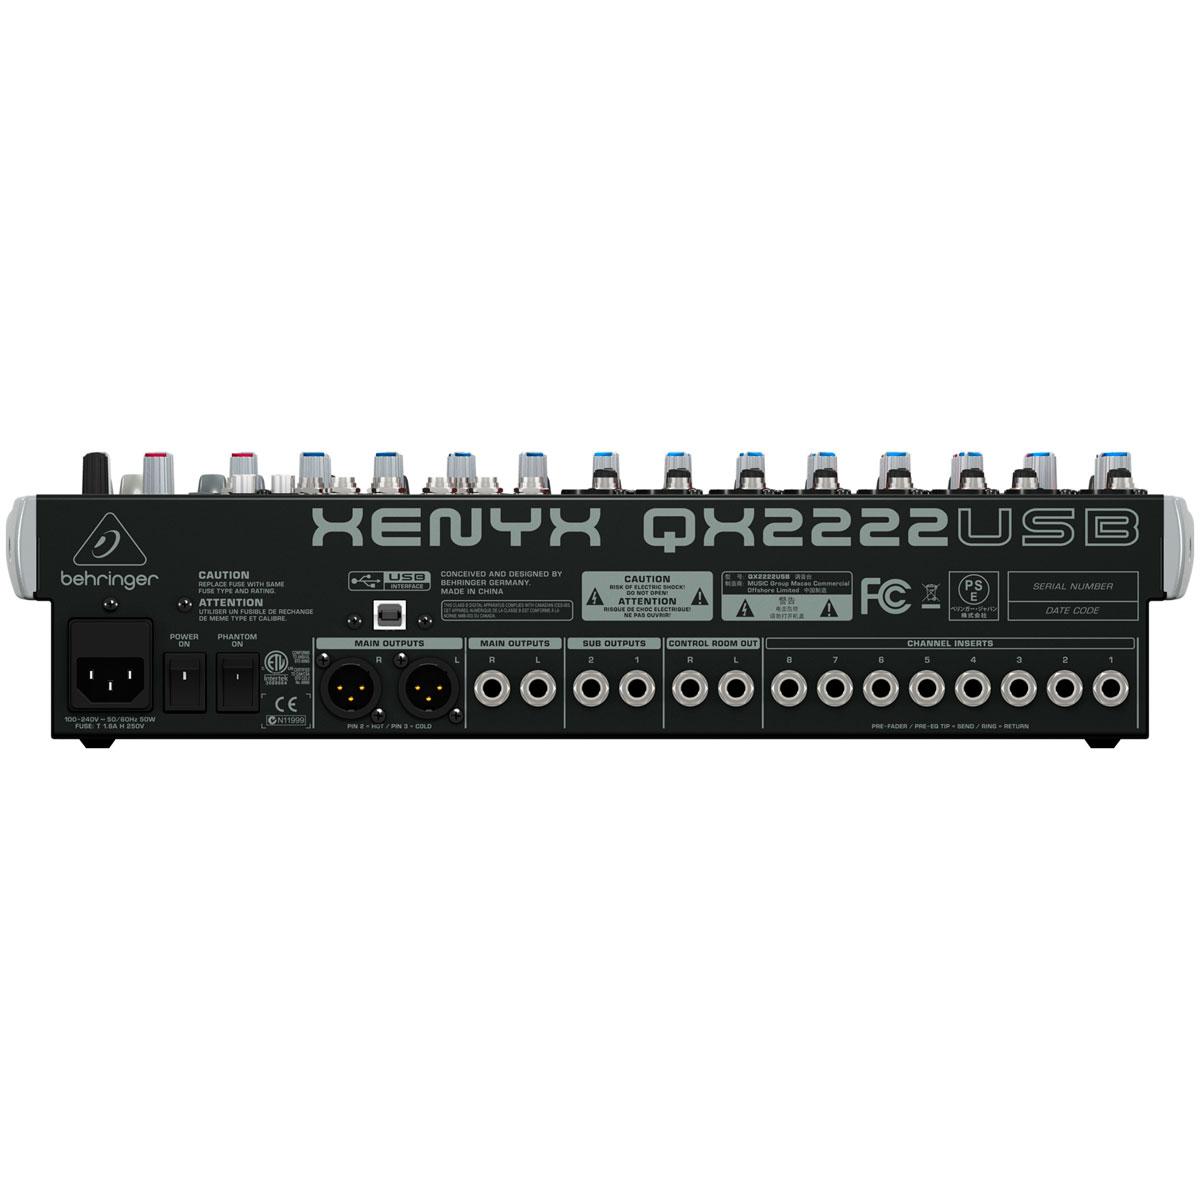 Mesa de Som 22 Canais Balanceados (8 XLR + 14 P10) c/ USB / Efeito / Phantom / 3 Auxiliares Xenyx QX 2222 USB - Behringer